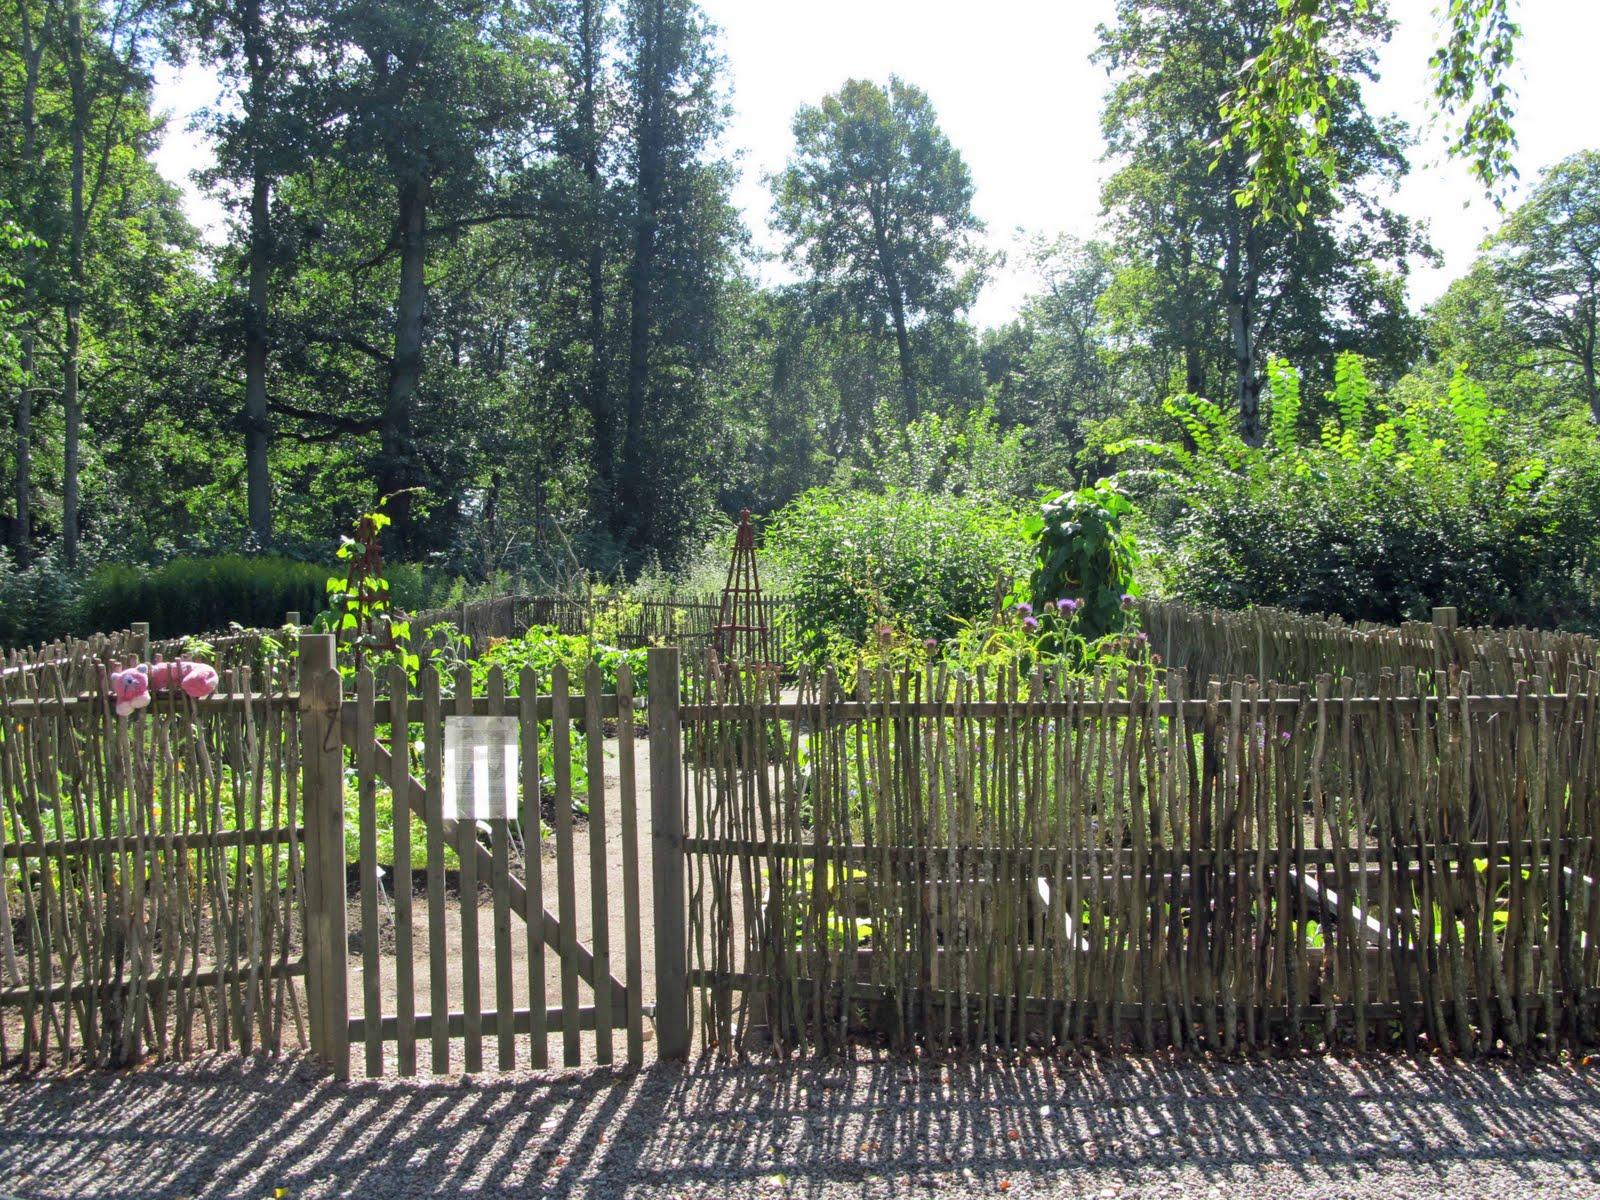 Garden Fences Ideas: Summit Musings: Friday Fences